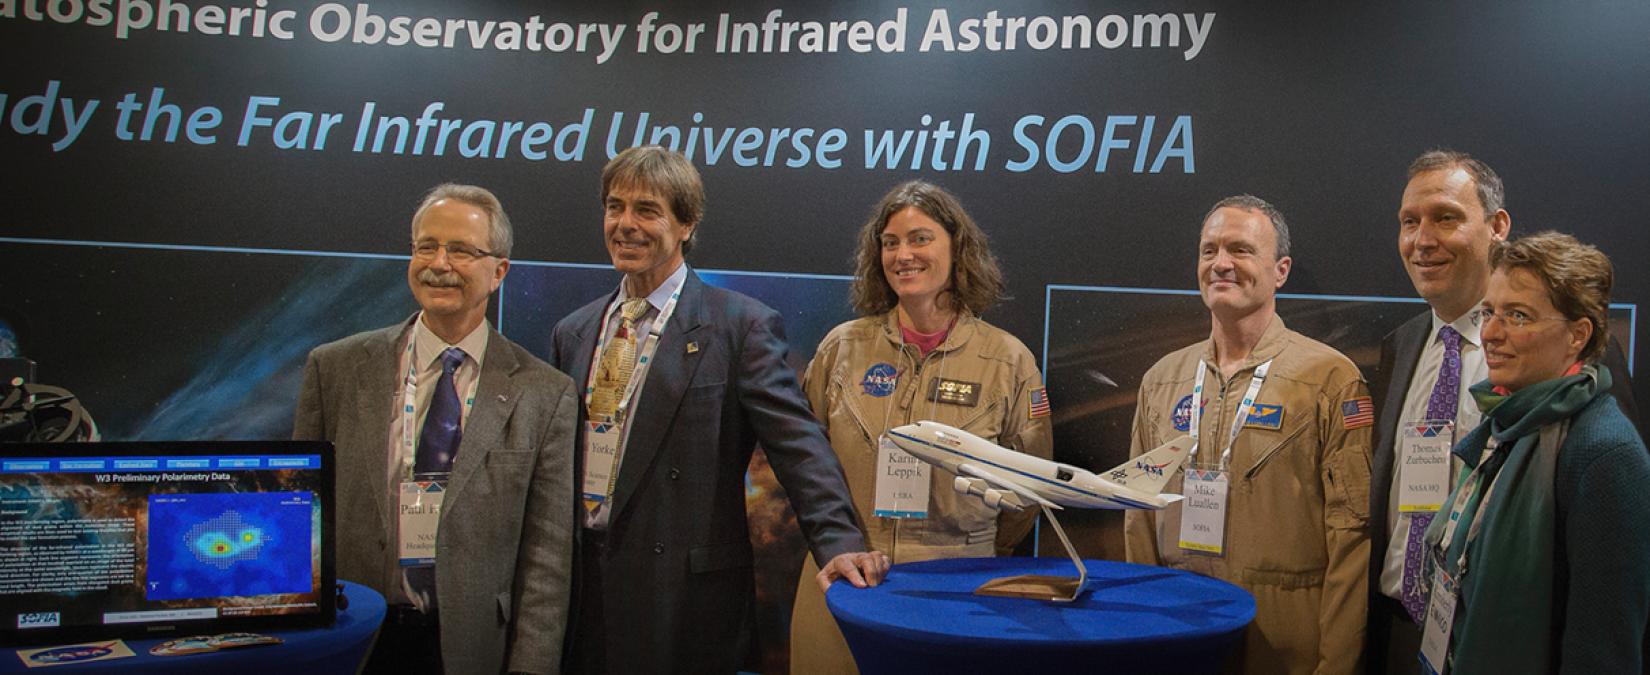 NASA and SOFIA staff at the SOFIA exhibit